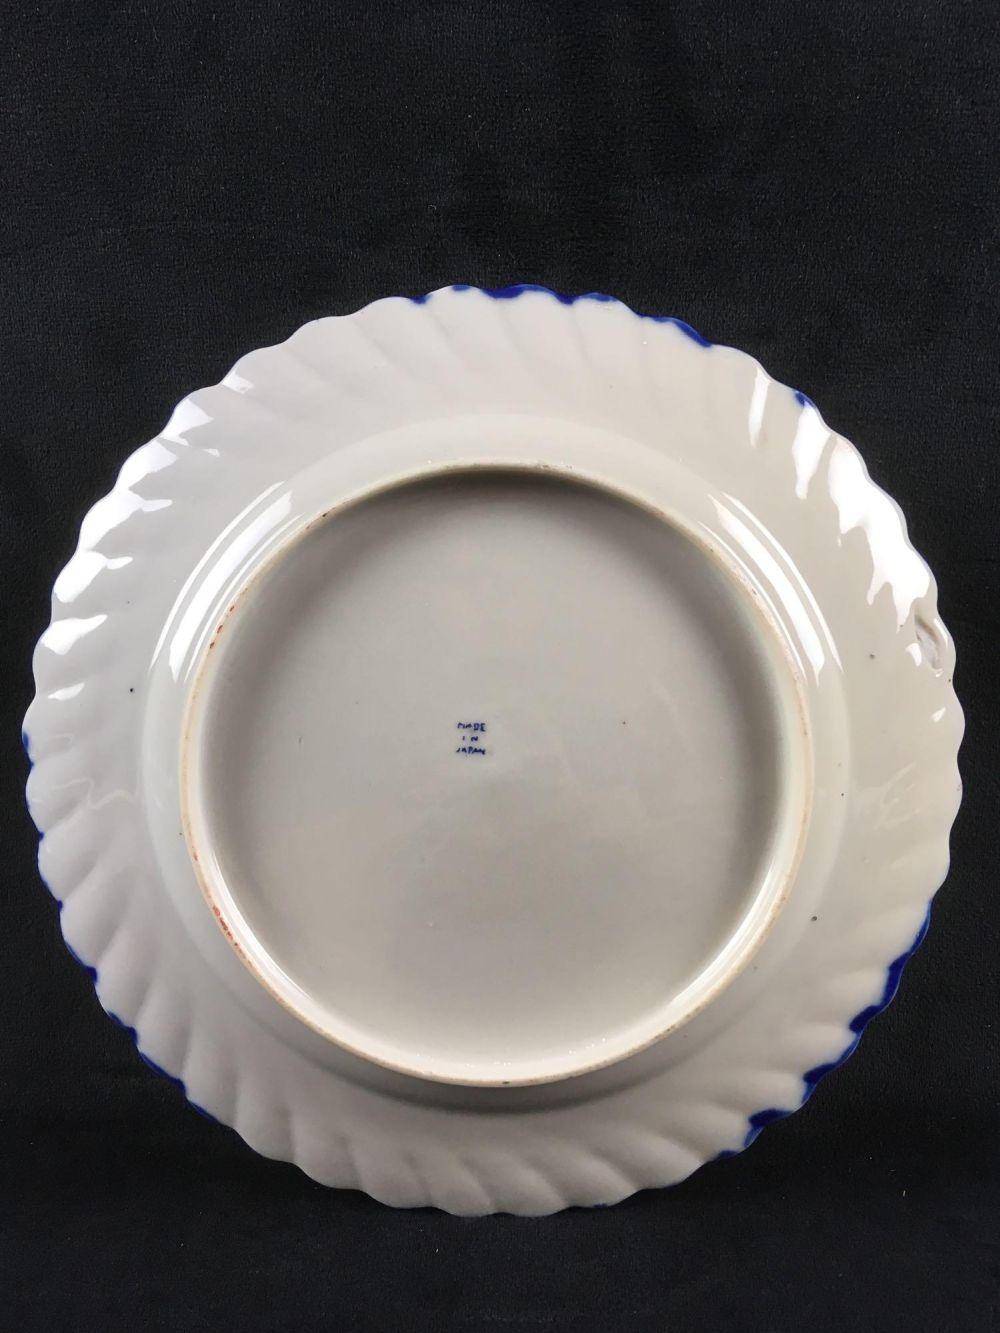 Lot 916: Japanese Cherry Blossom Plate